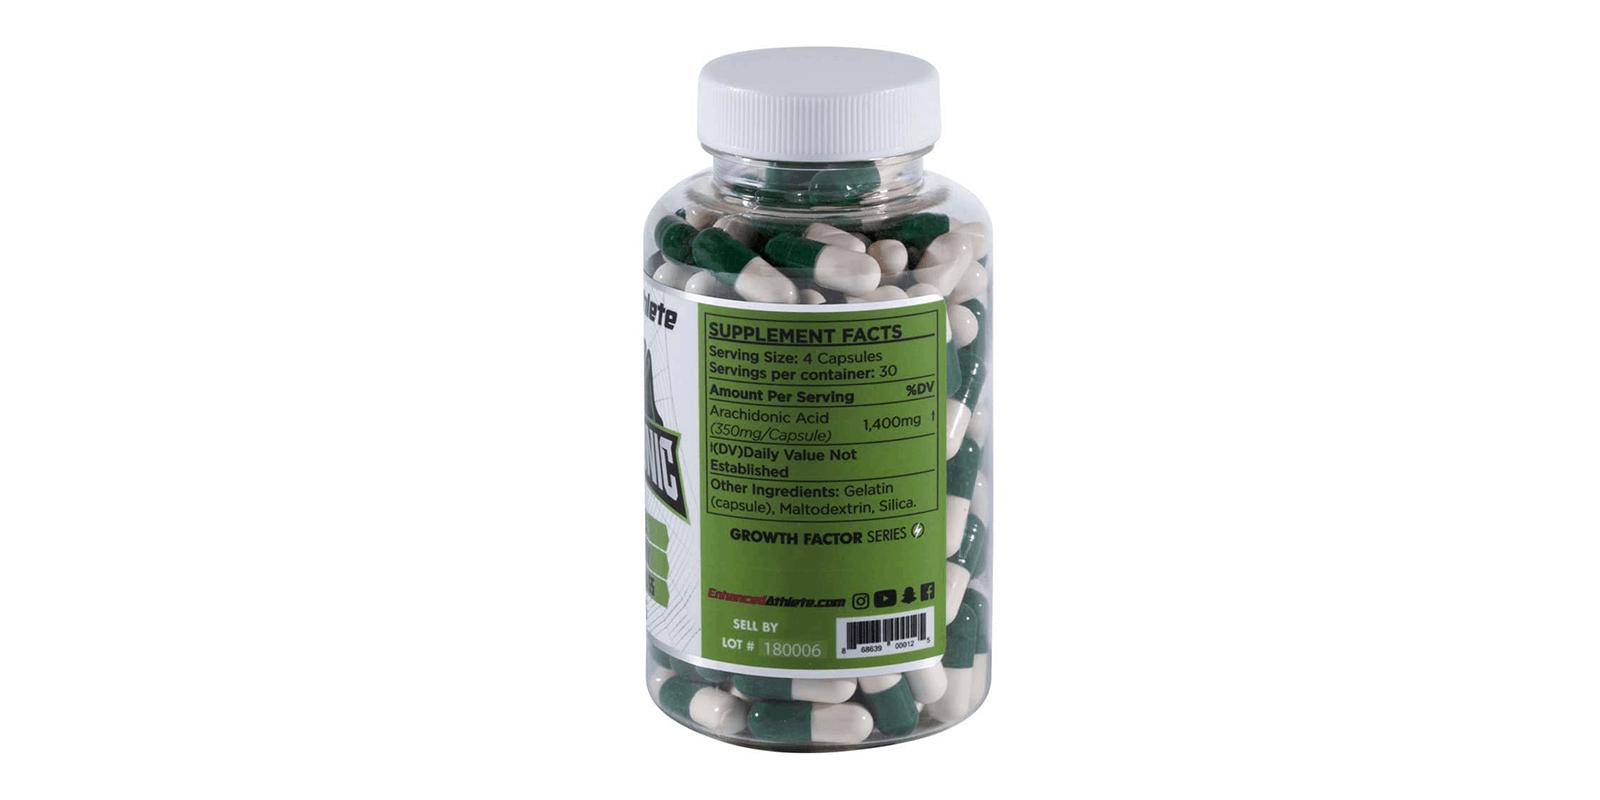 Enhanced Arachidonic Acid Supplement ingredients